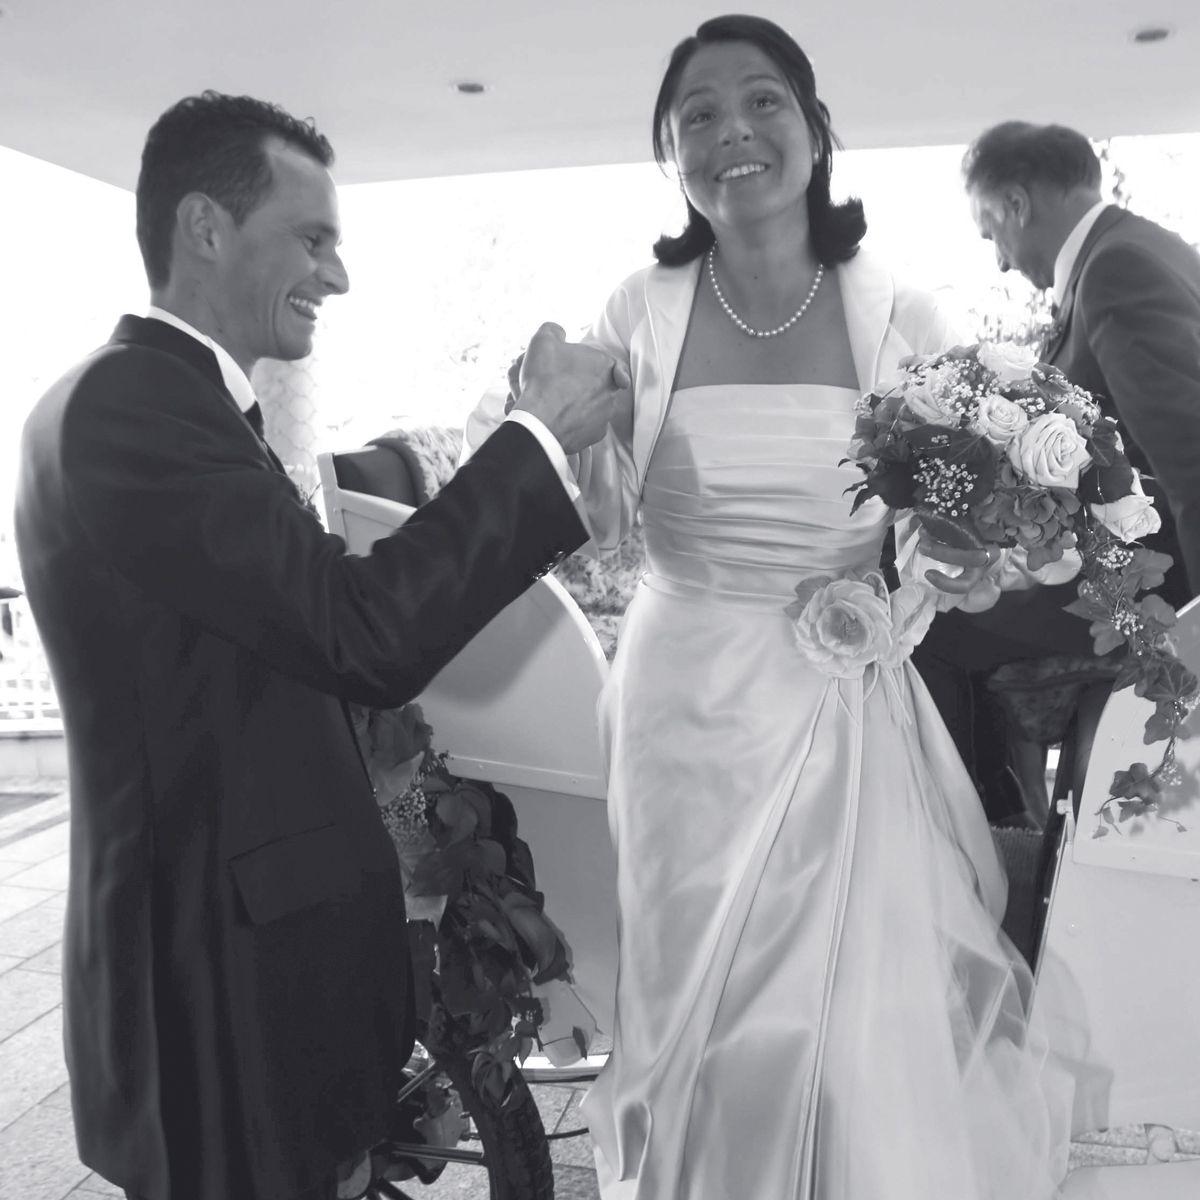 Isolde Kostner and Werner Perathoner wearing Carlo Pignatelli creations at  their #weddingday. #matrimonio #sposo #groom #sposa #bride #weddingdress  #weddin…